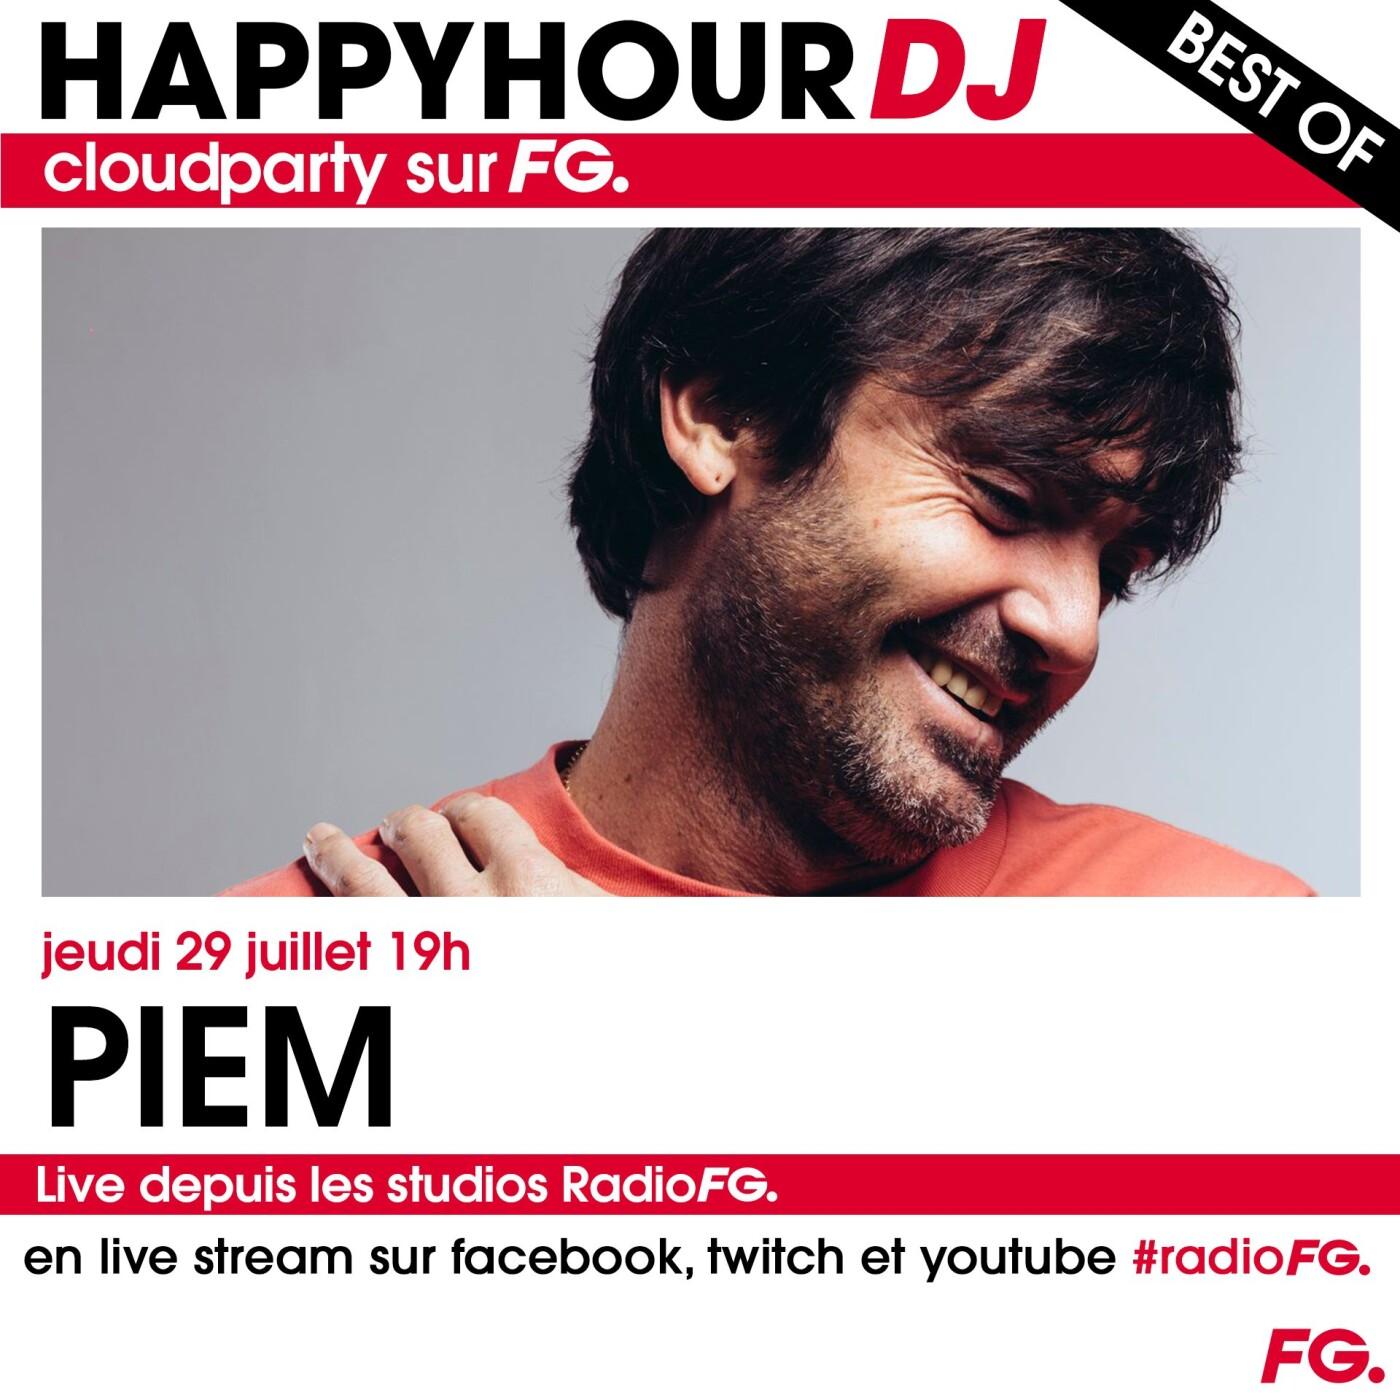 HAPPY HOUR DJ BEST OF : PIEM